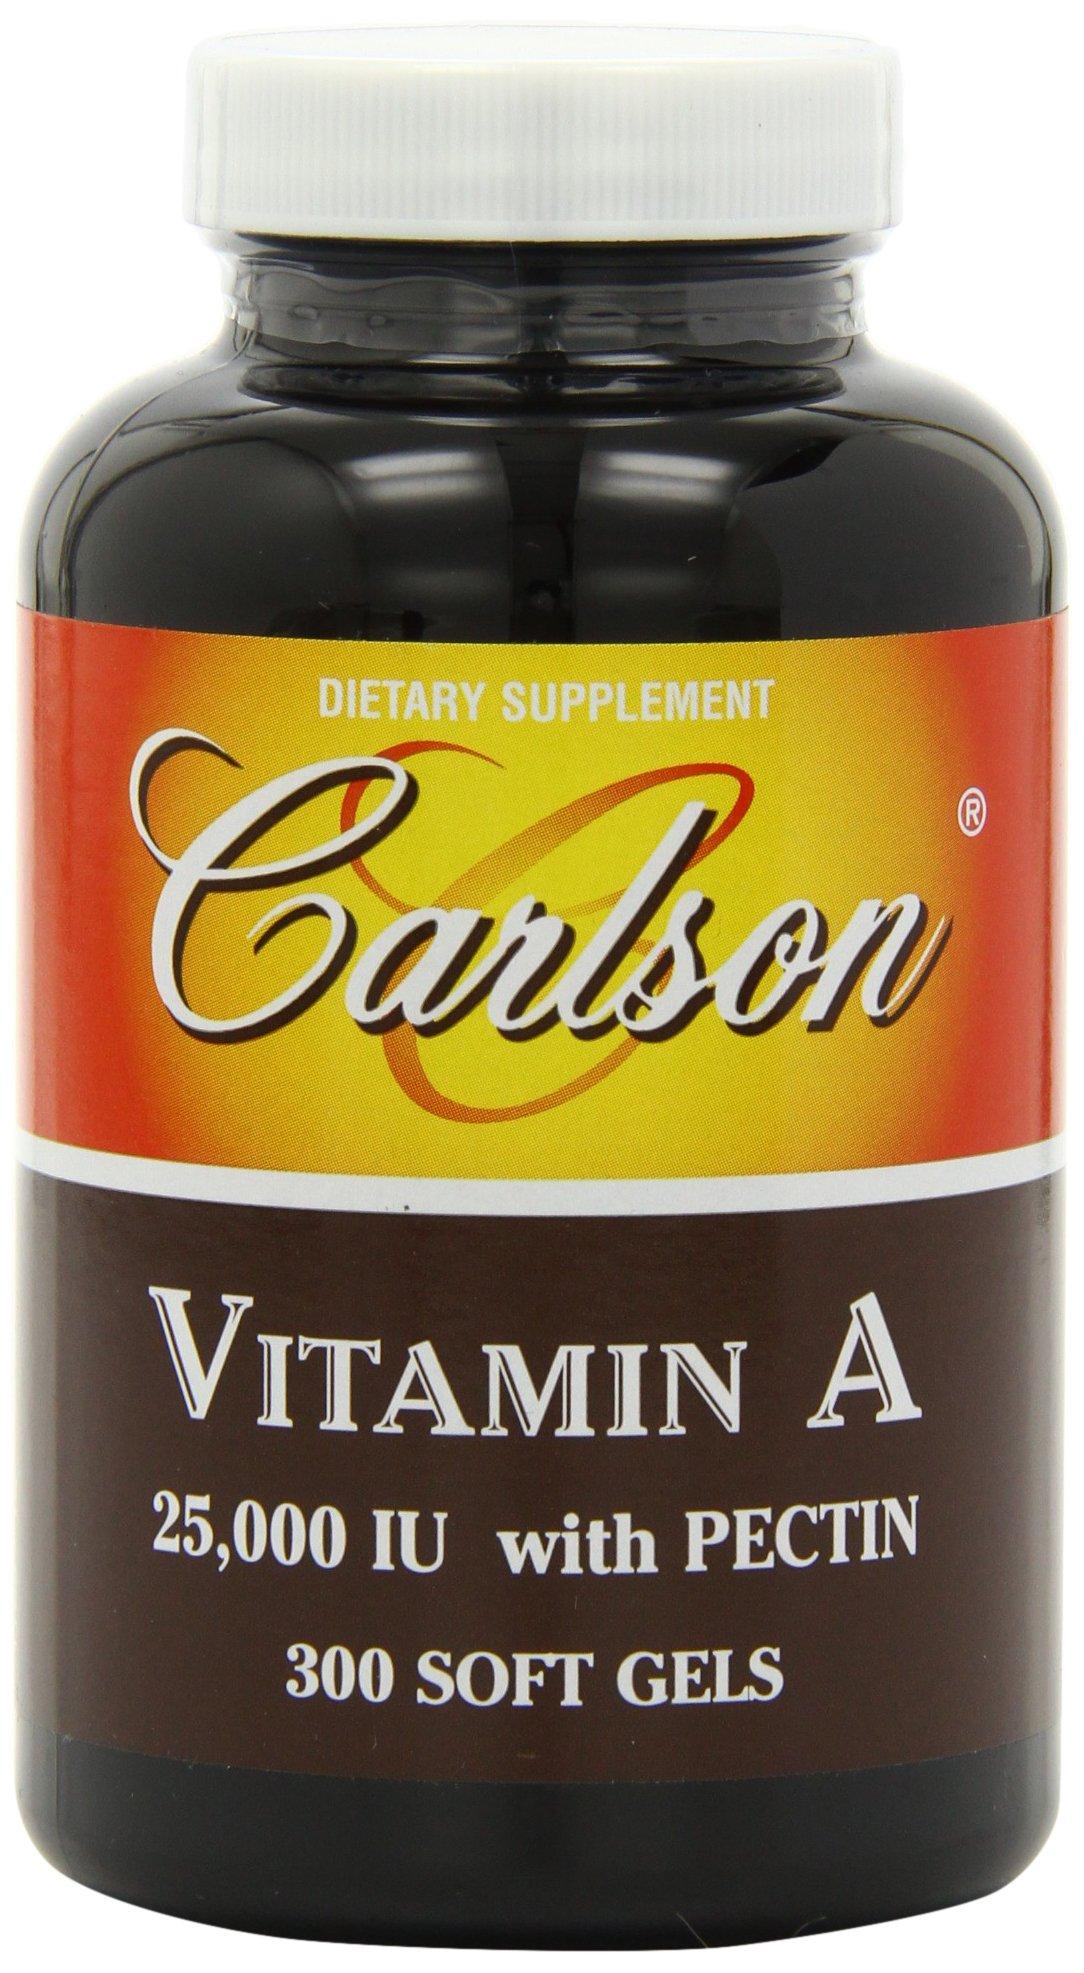 Carlson Labs Vitamin A with Pectin, 25000 IU, 300 Softgels